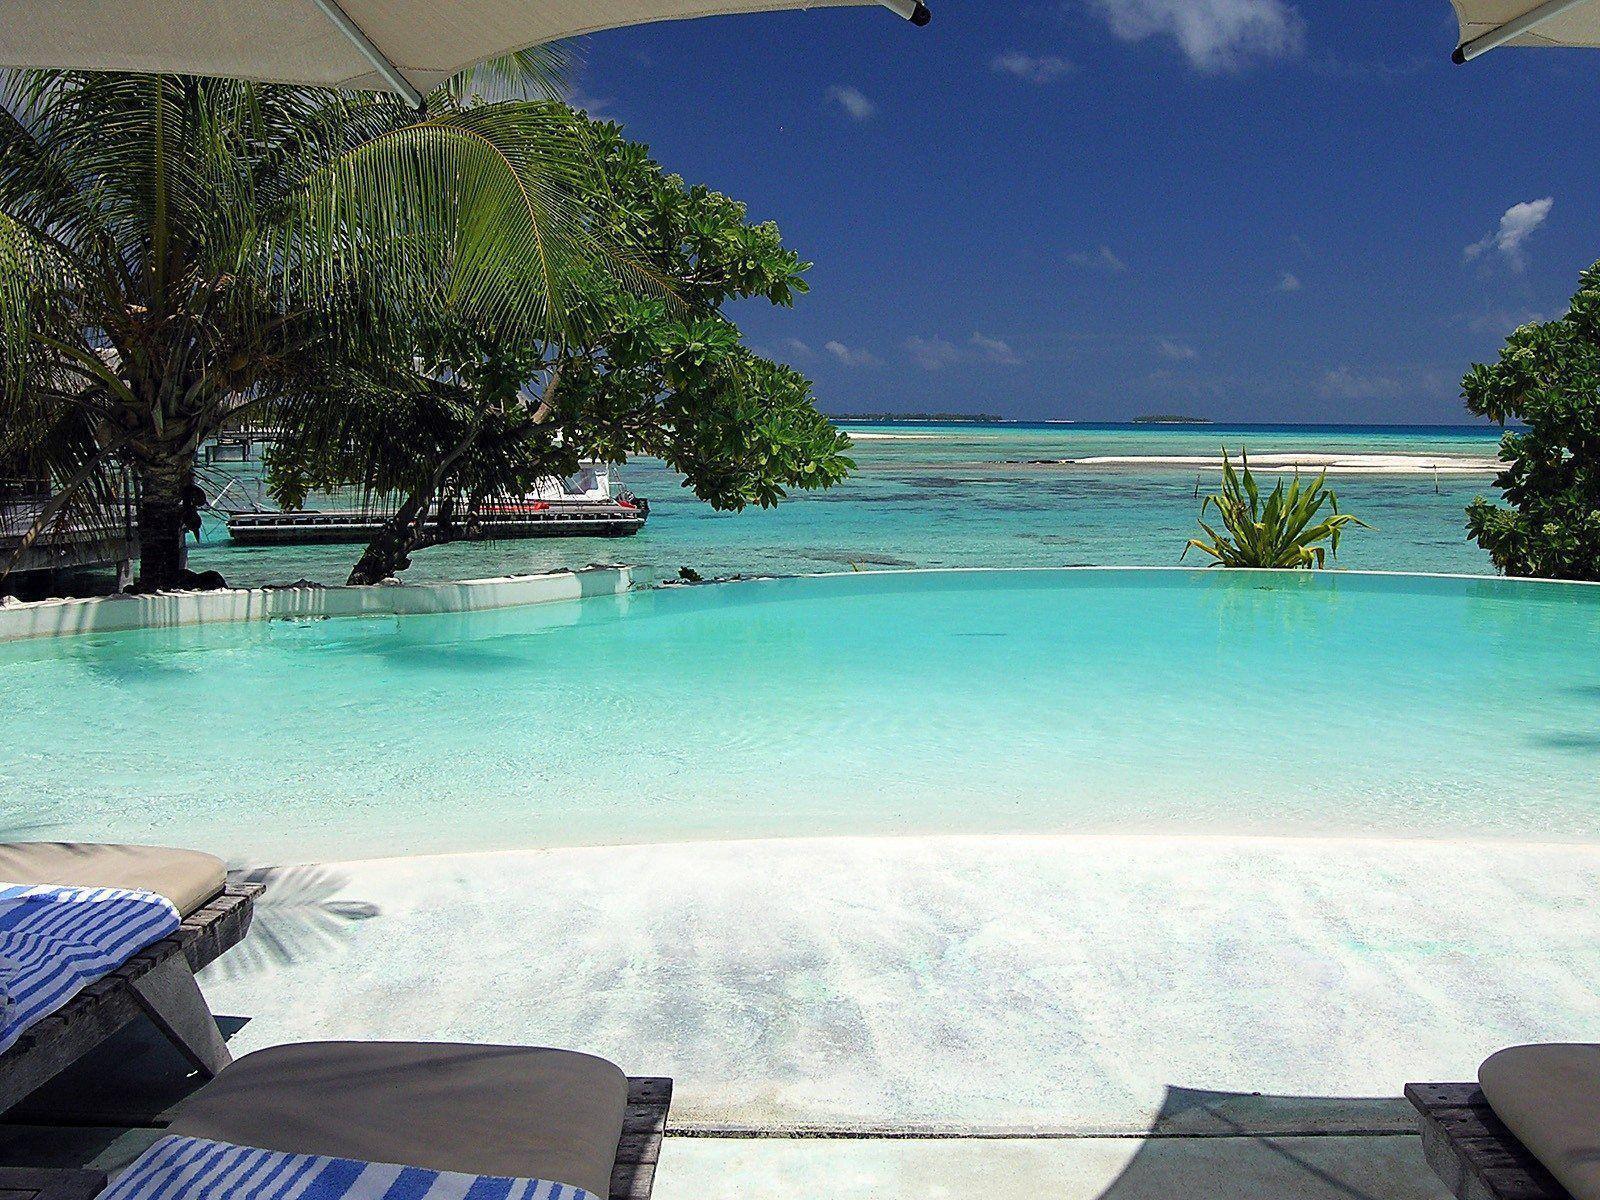 Hd Tropical Island Beach Paradise Wallpapers And Backgrounds: Tropical Backgrounds For Computer